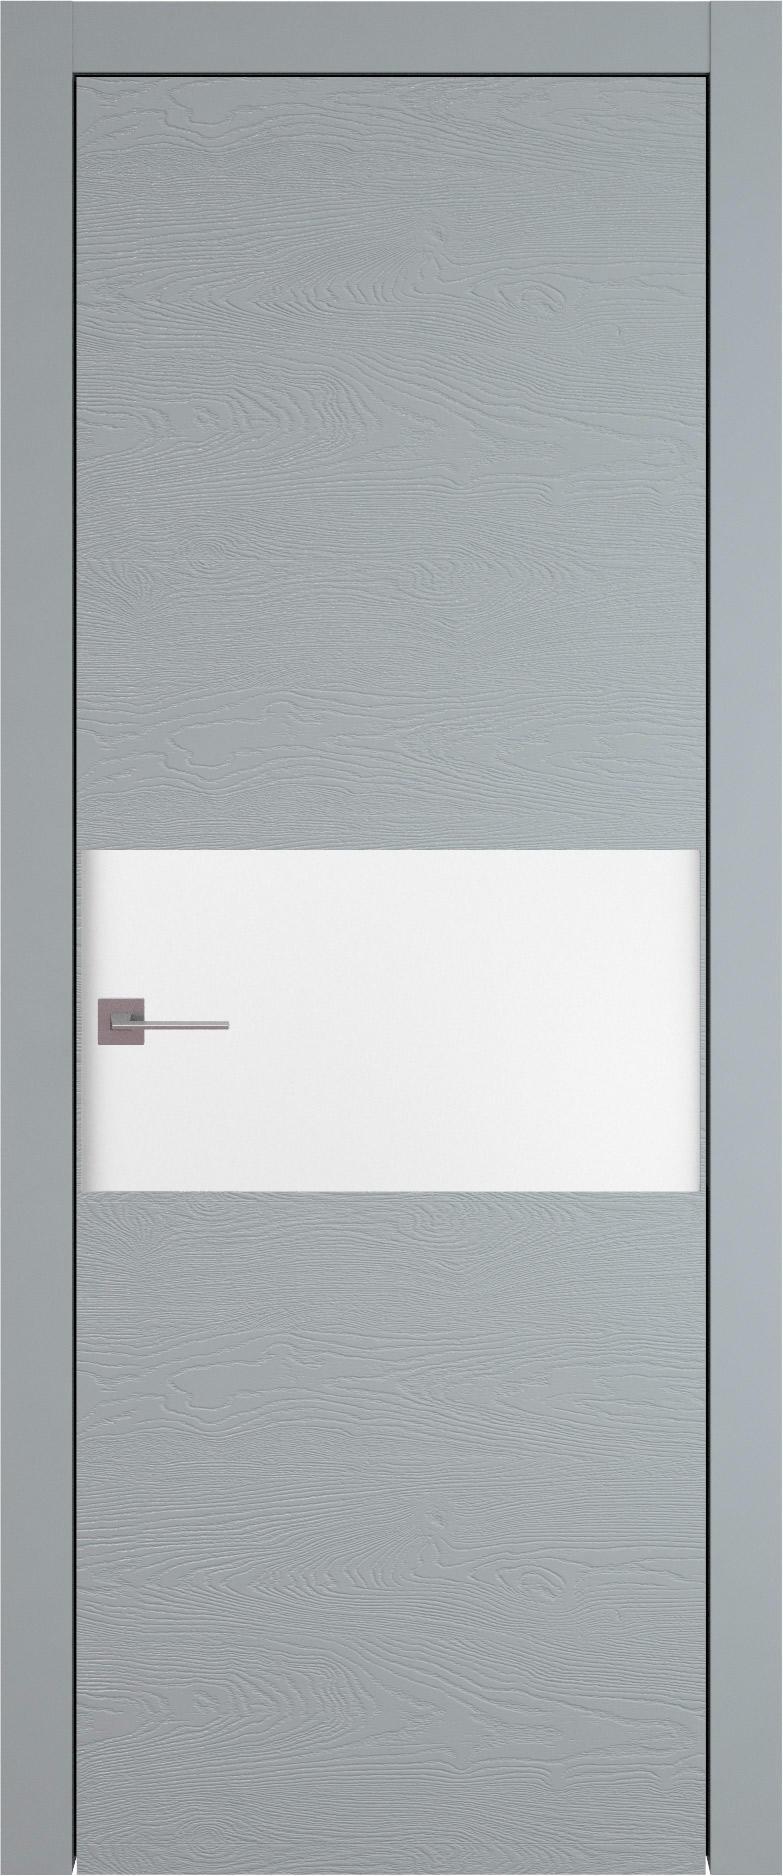 Tivoli Е-4 цвет - Серебристо-серая эмаль по шпону (RAL 7045) Без стекла (ДГ)